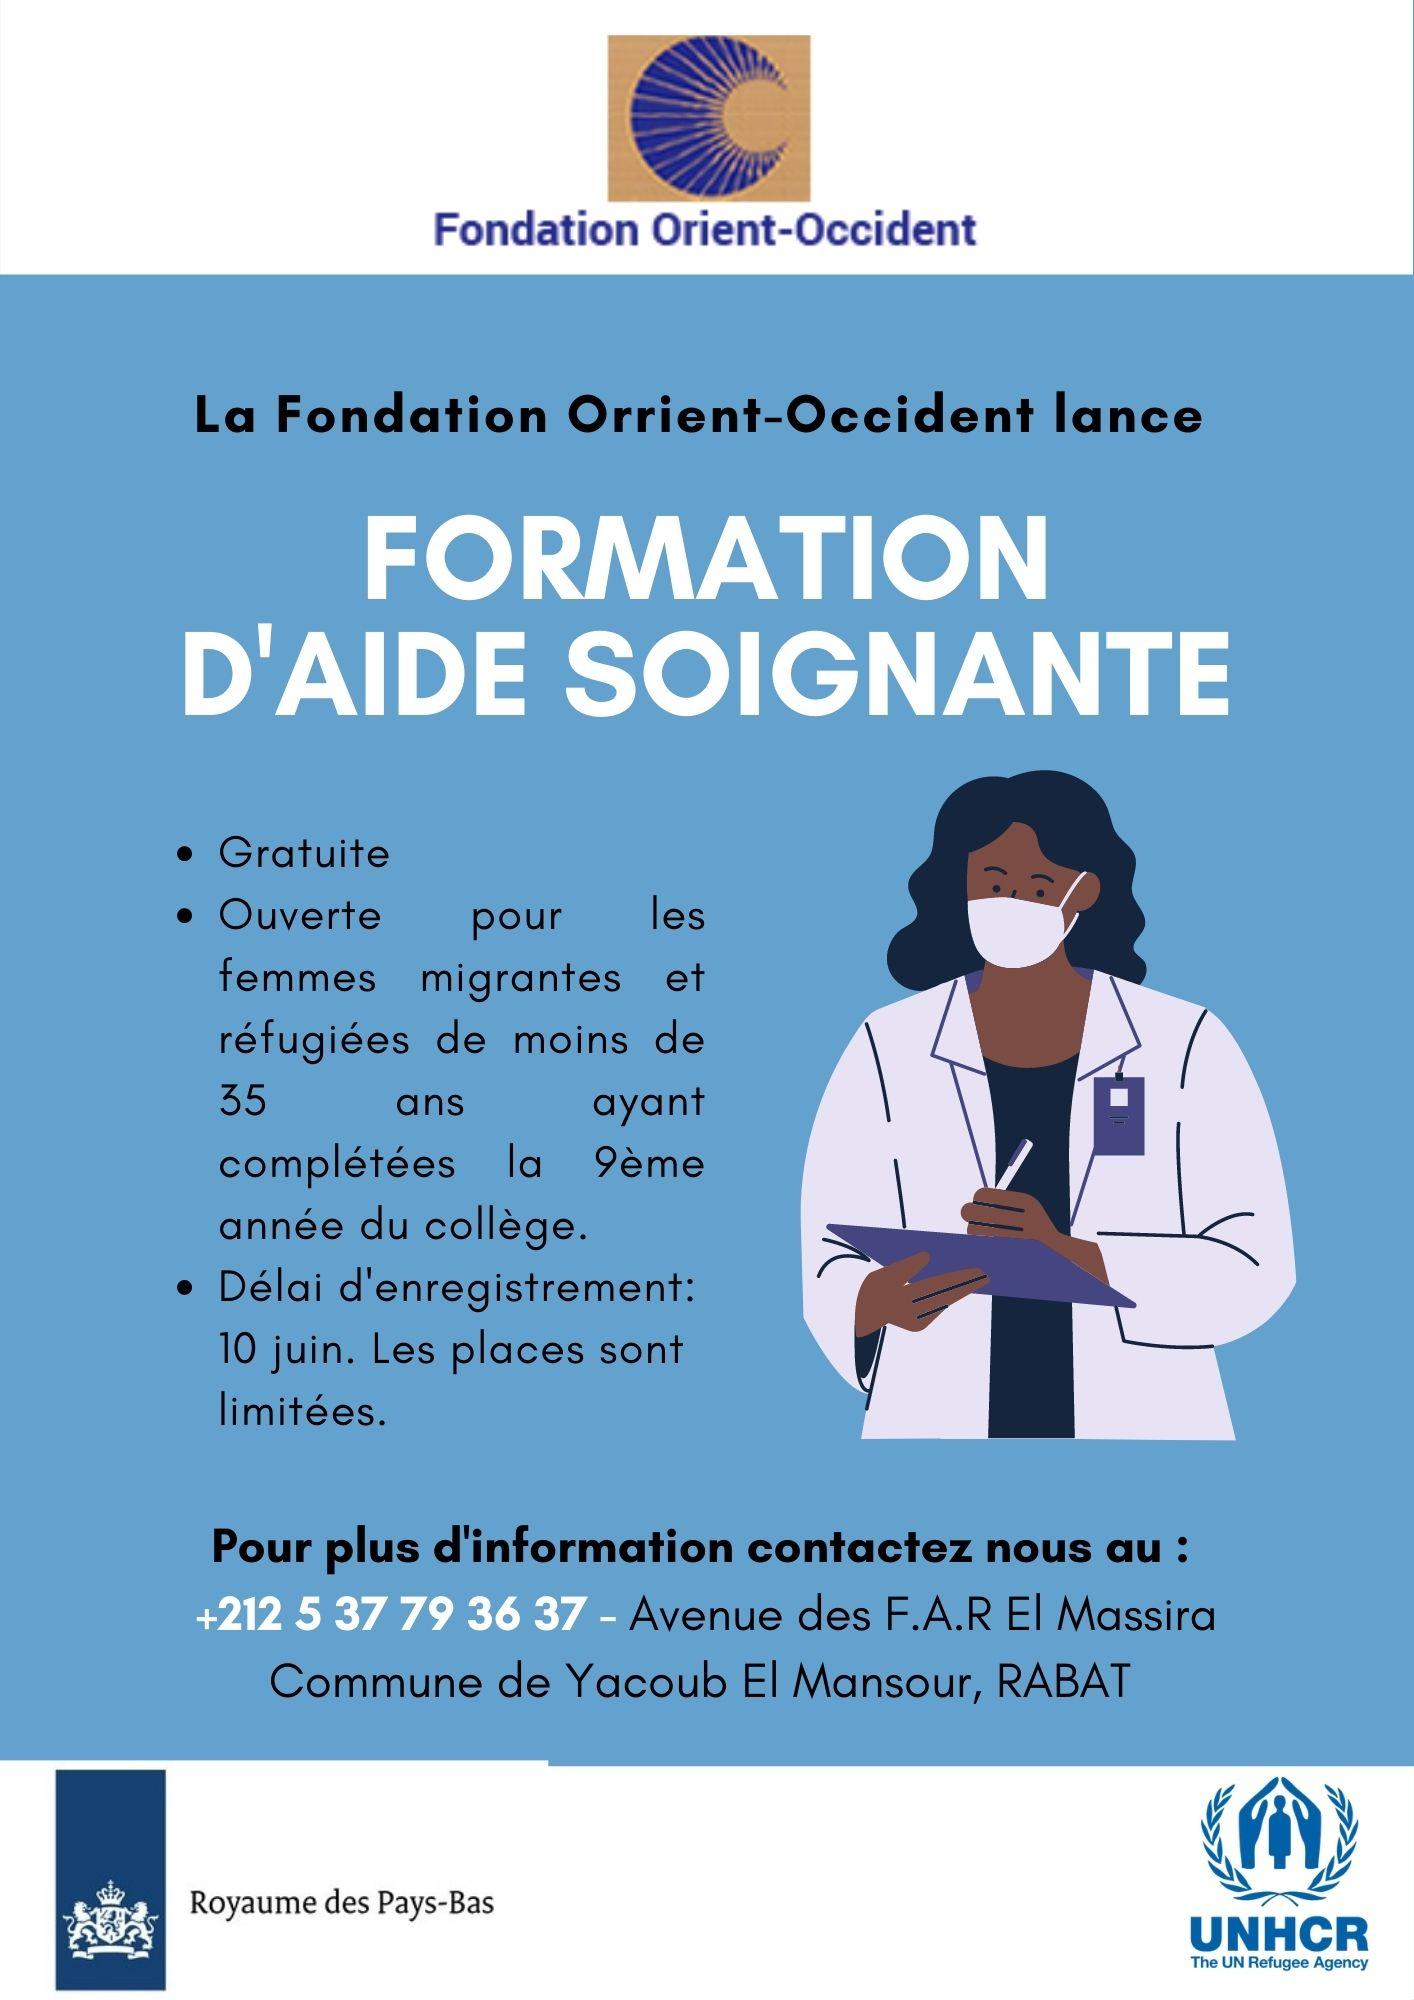 Caregiver training at the Fondation Orient-Occident in Rabat